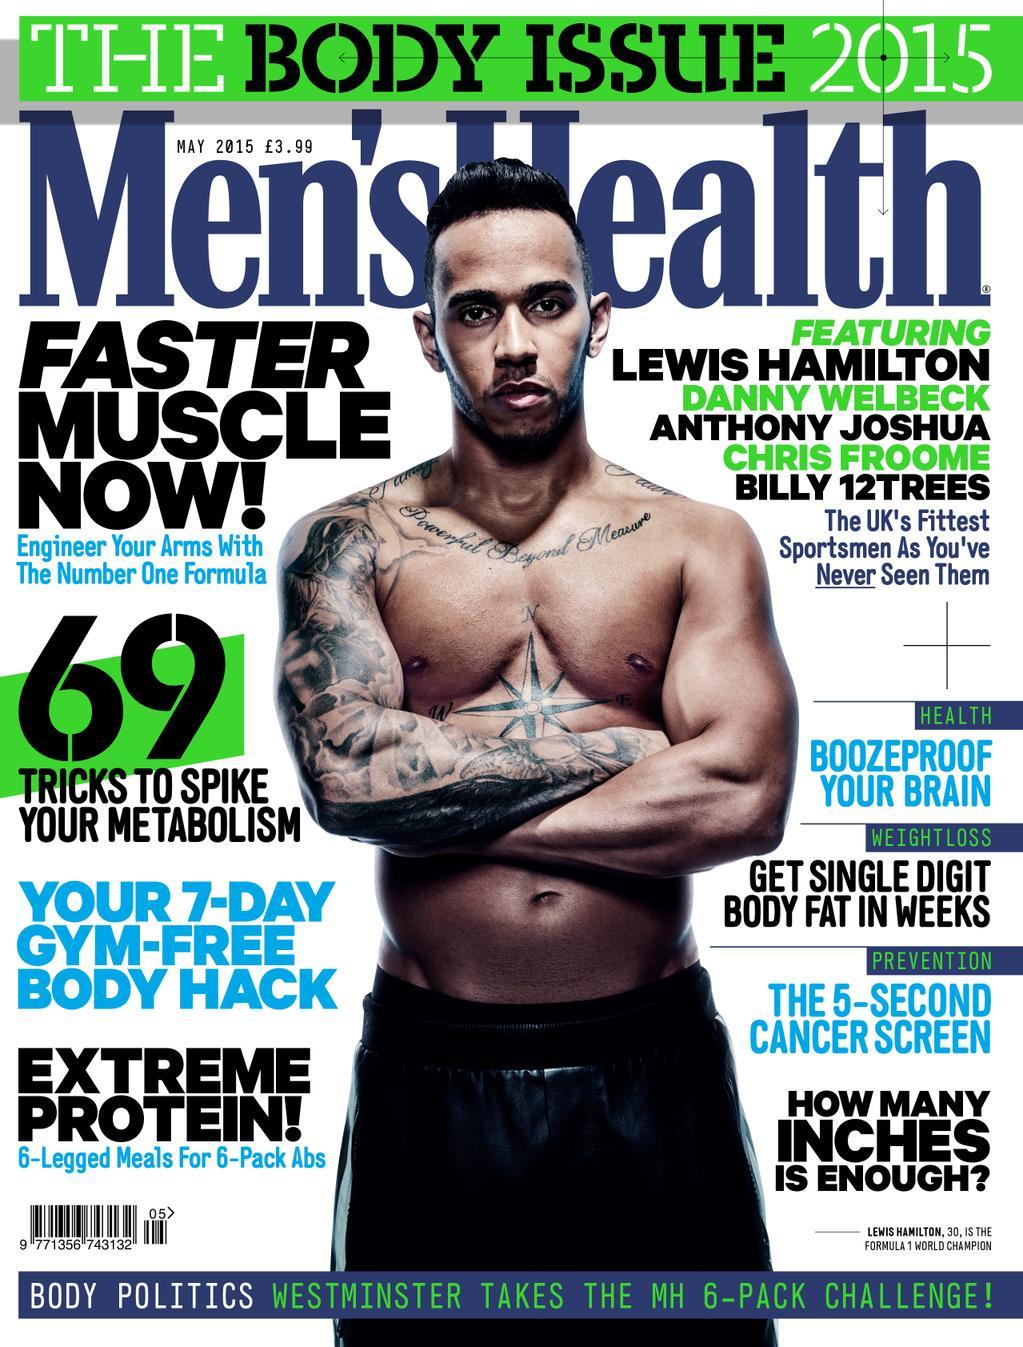 Mens Health Magazine President Barack Obama Instant Energy: 7 Headline Writing Tips That Get Clicks